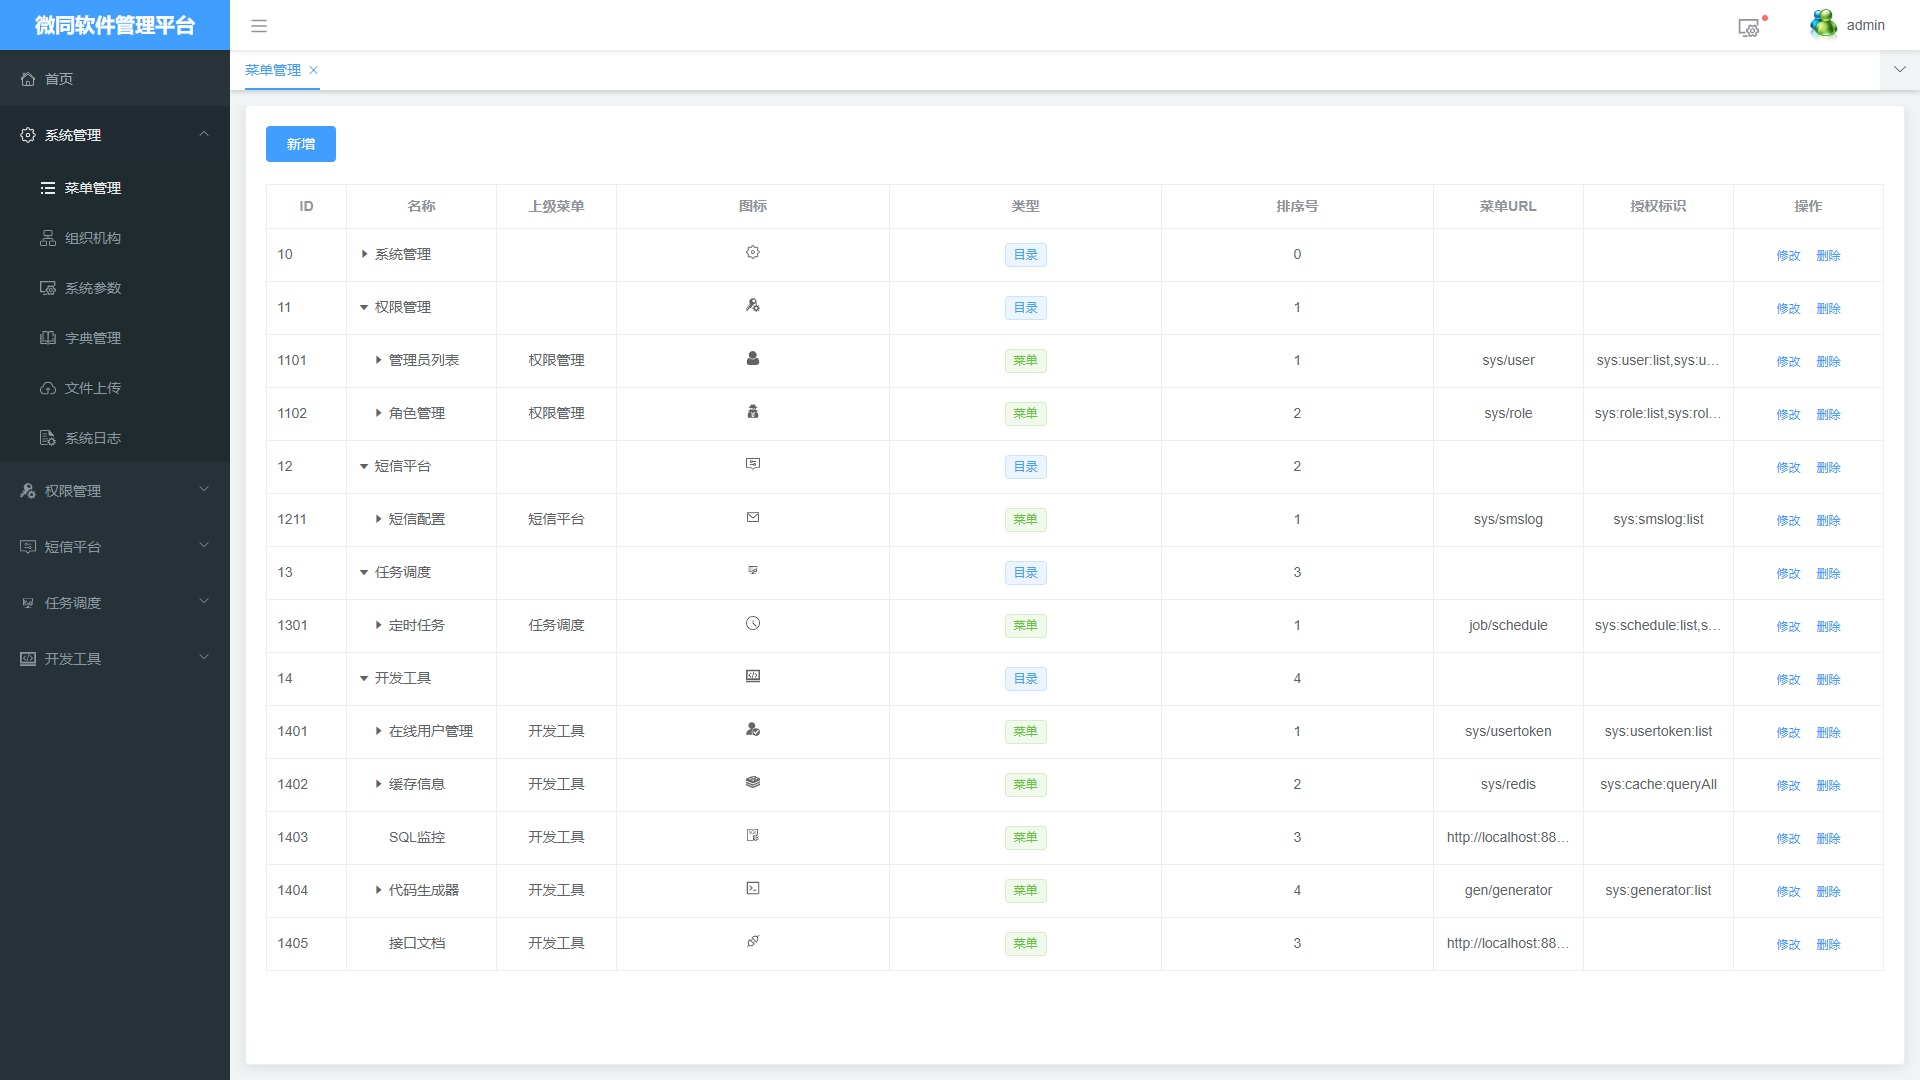 https://platform-wxmall.oss-cn-beijing.aliyuncs.com/upload/platform-plus/platform-plus.jpg